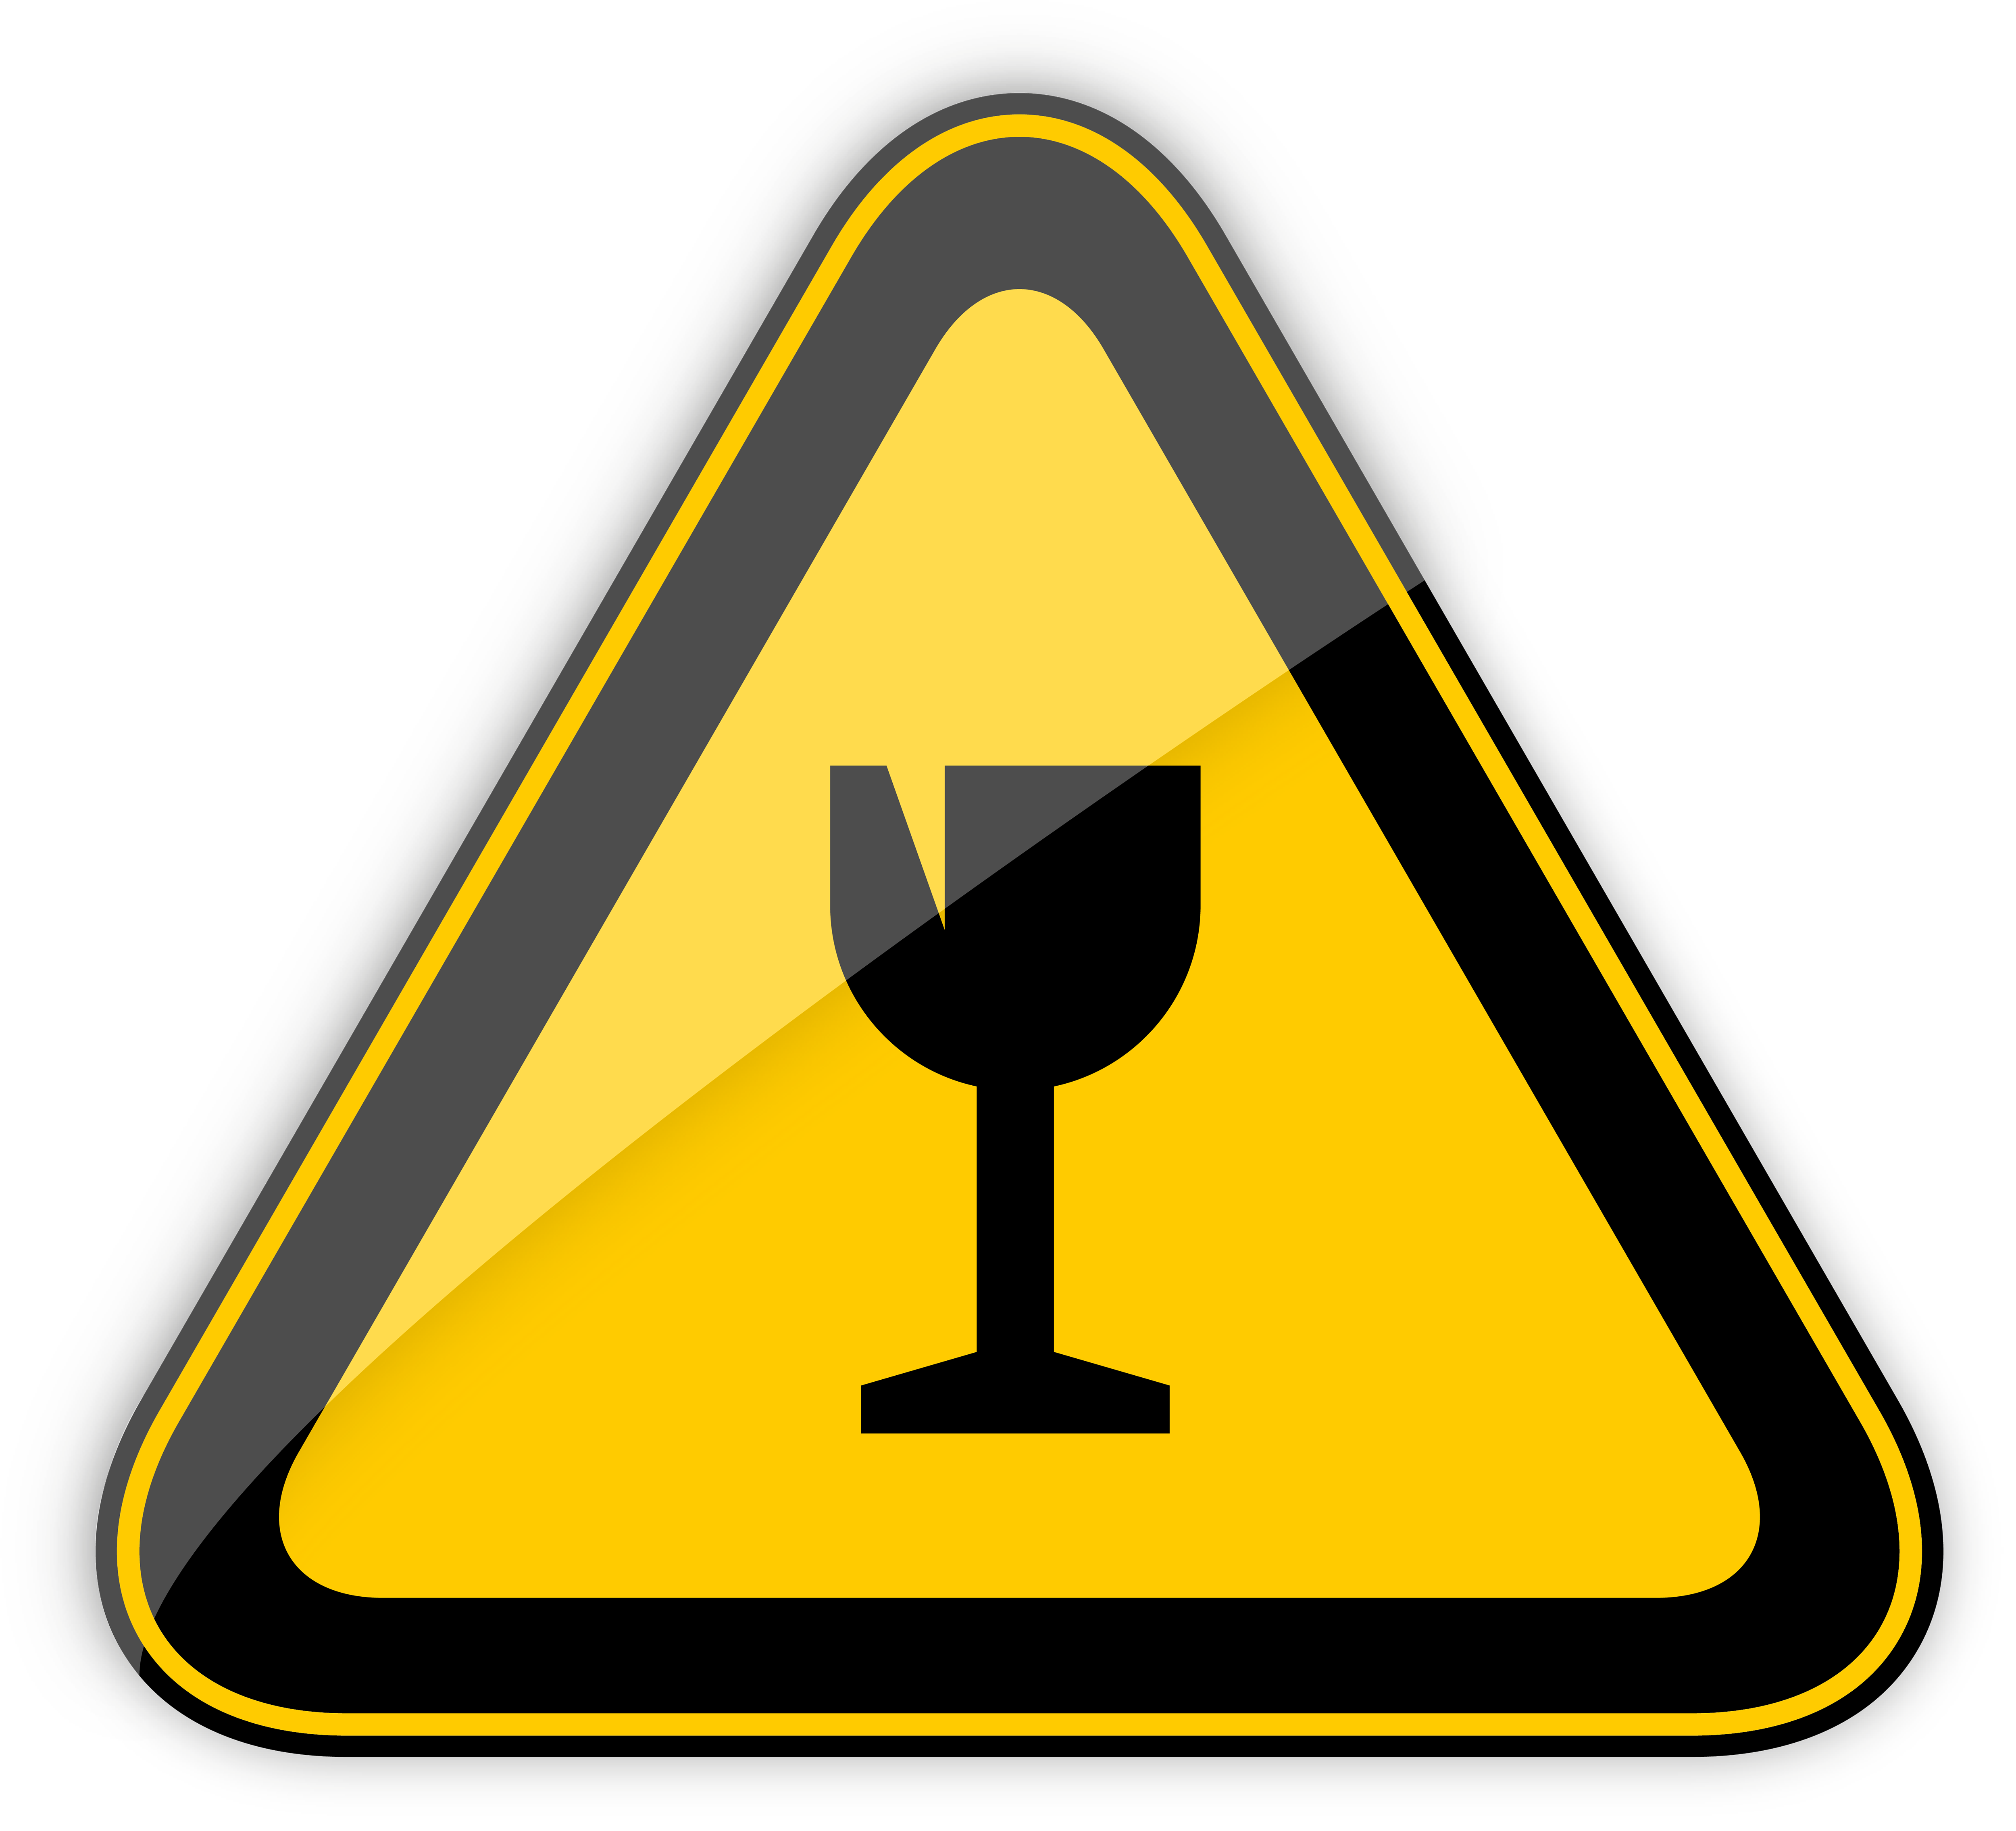 transparent stock Fragile sign png best. Caution clipart warning light